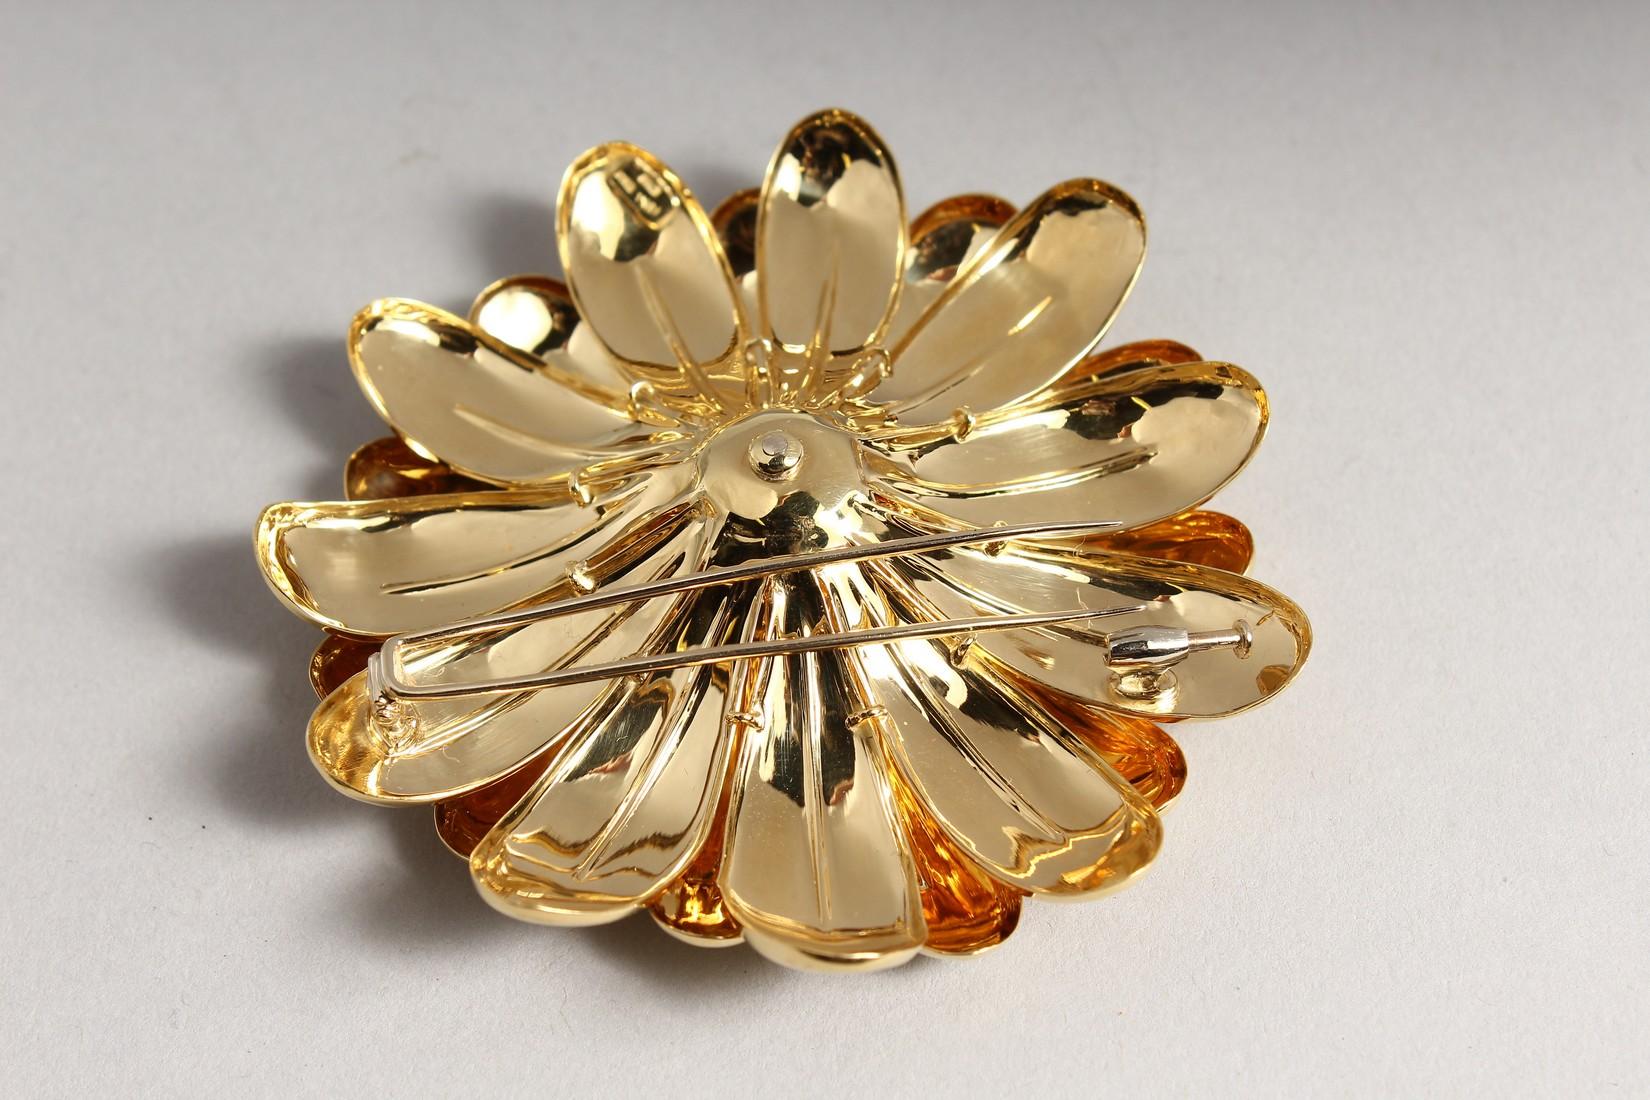 A SUPERB 18CT GOLD FLOWER BROOCH 7cm diameter, with P set diamond centre. 48gms - Image 2 of 3